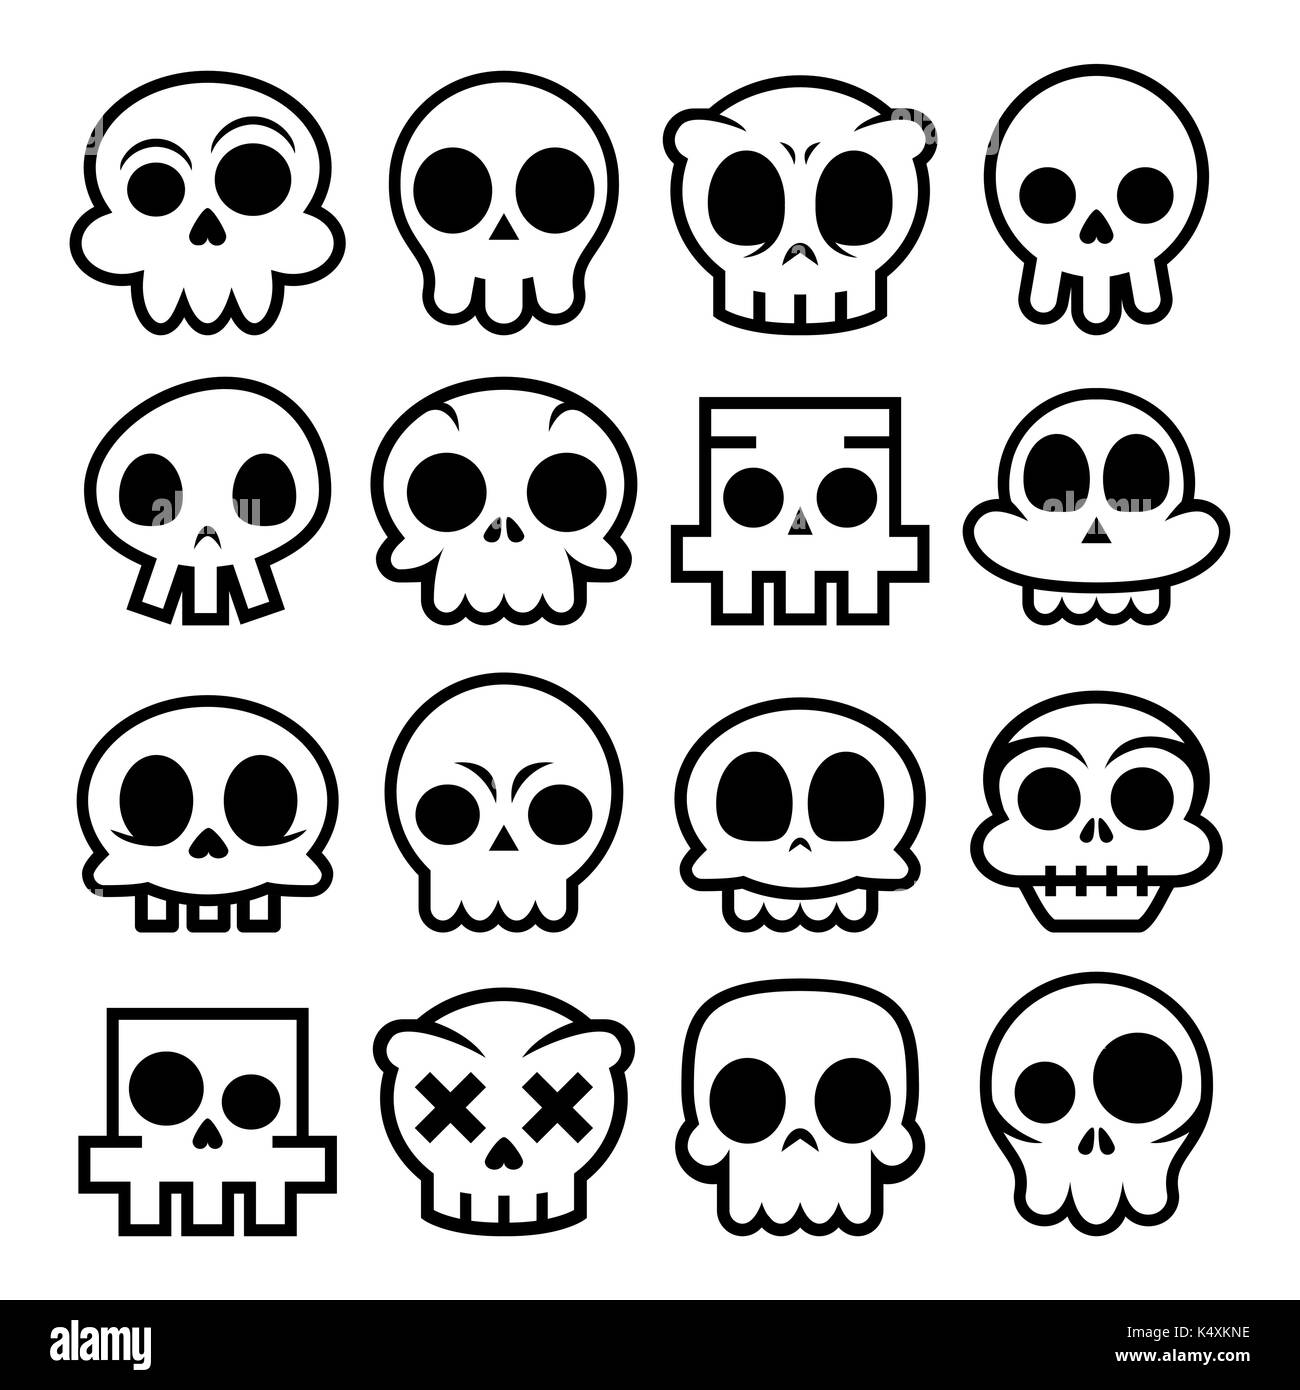 Sugar Skulls Imágenes De Stock & Sugar Skulls Fotos De Stock - Alamy